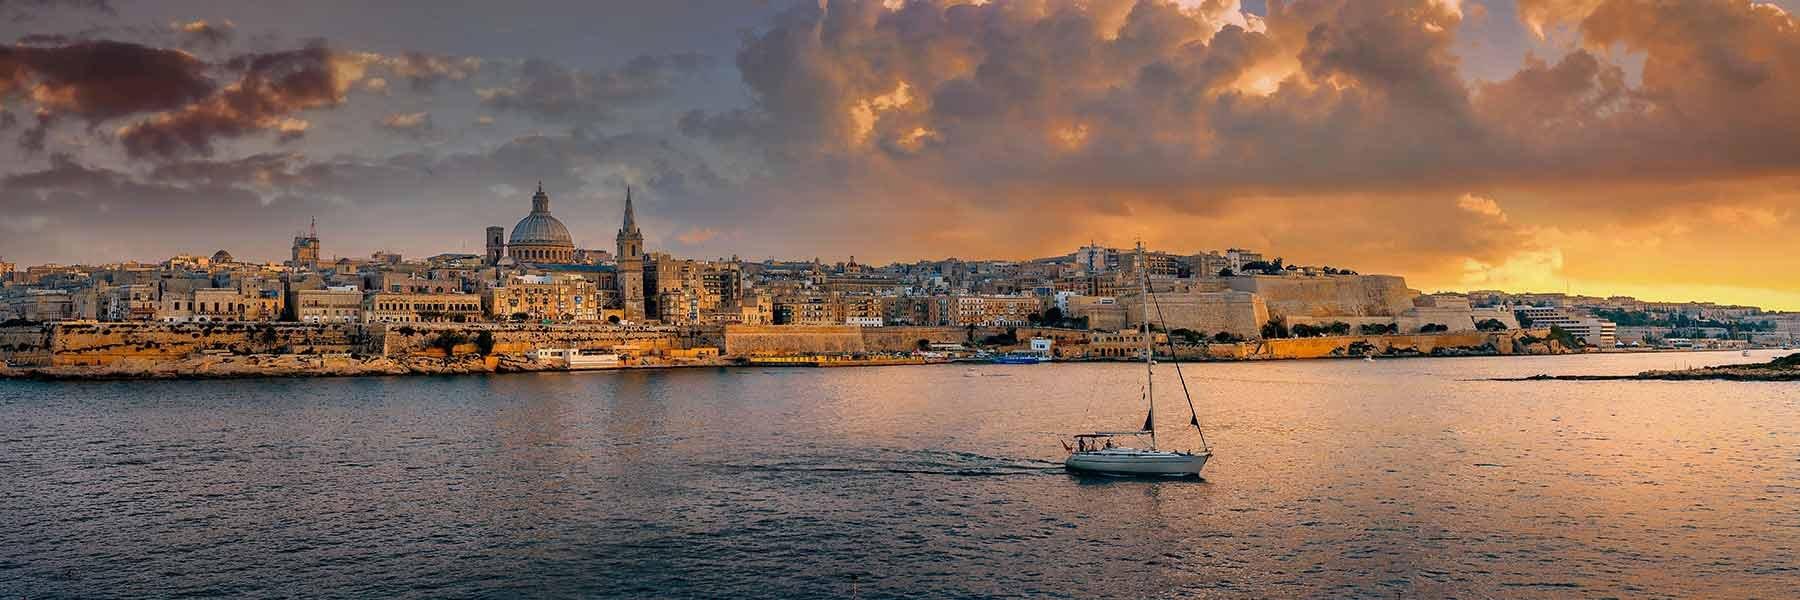 How to Obtain Maltese Citizenship